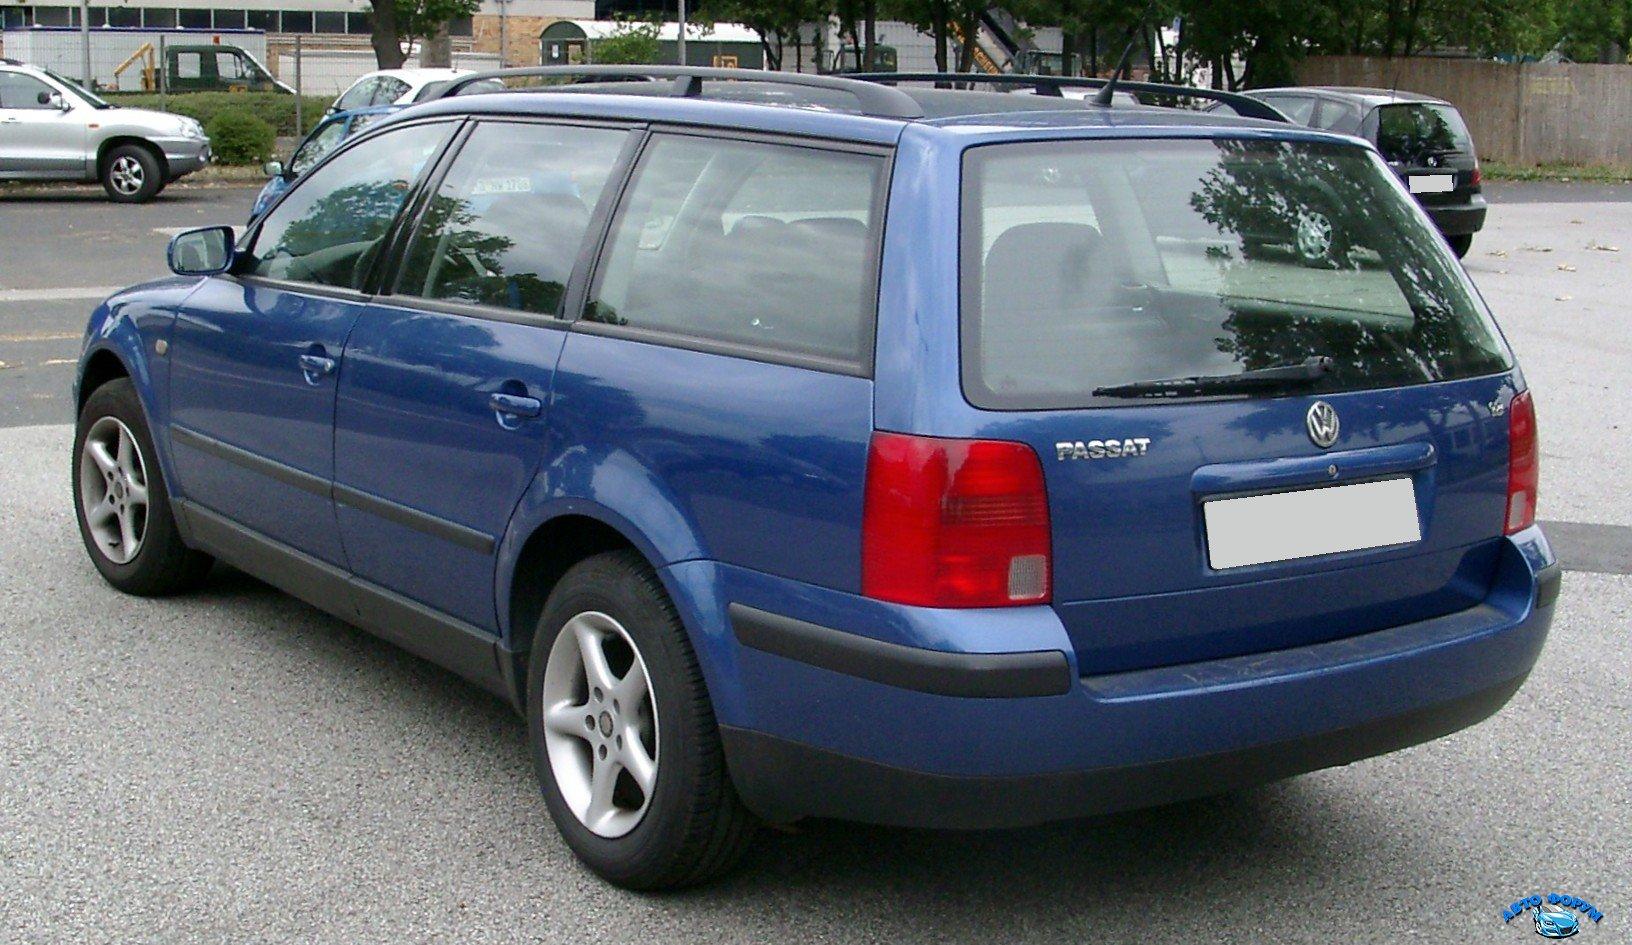 VW_Passat_B5_Variant_rear_20080801.jpg